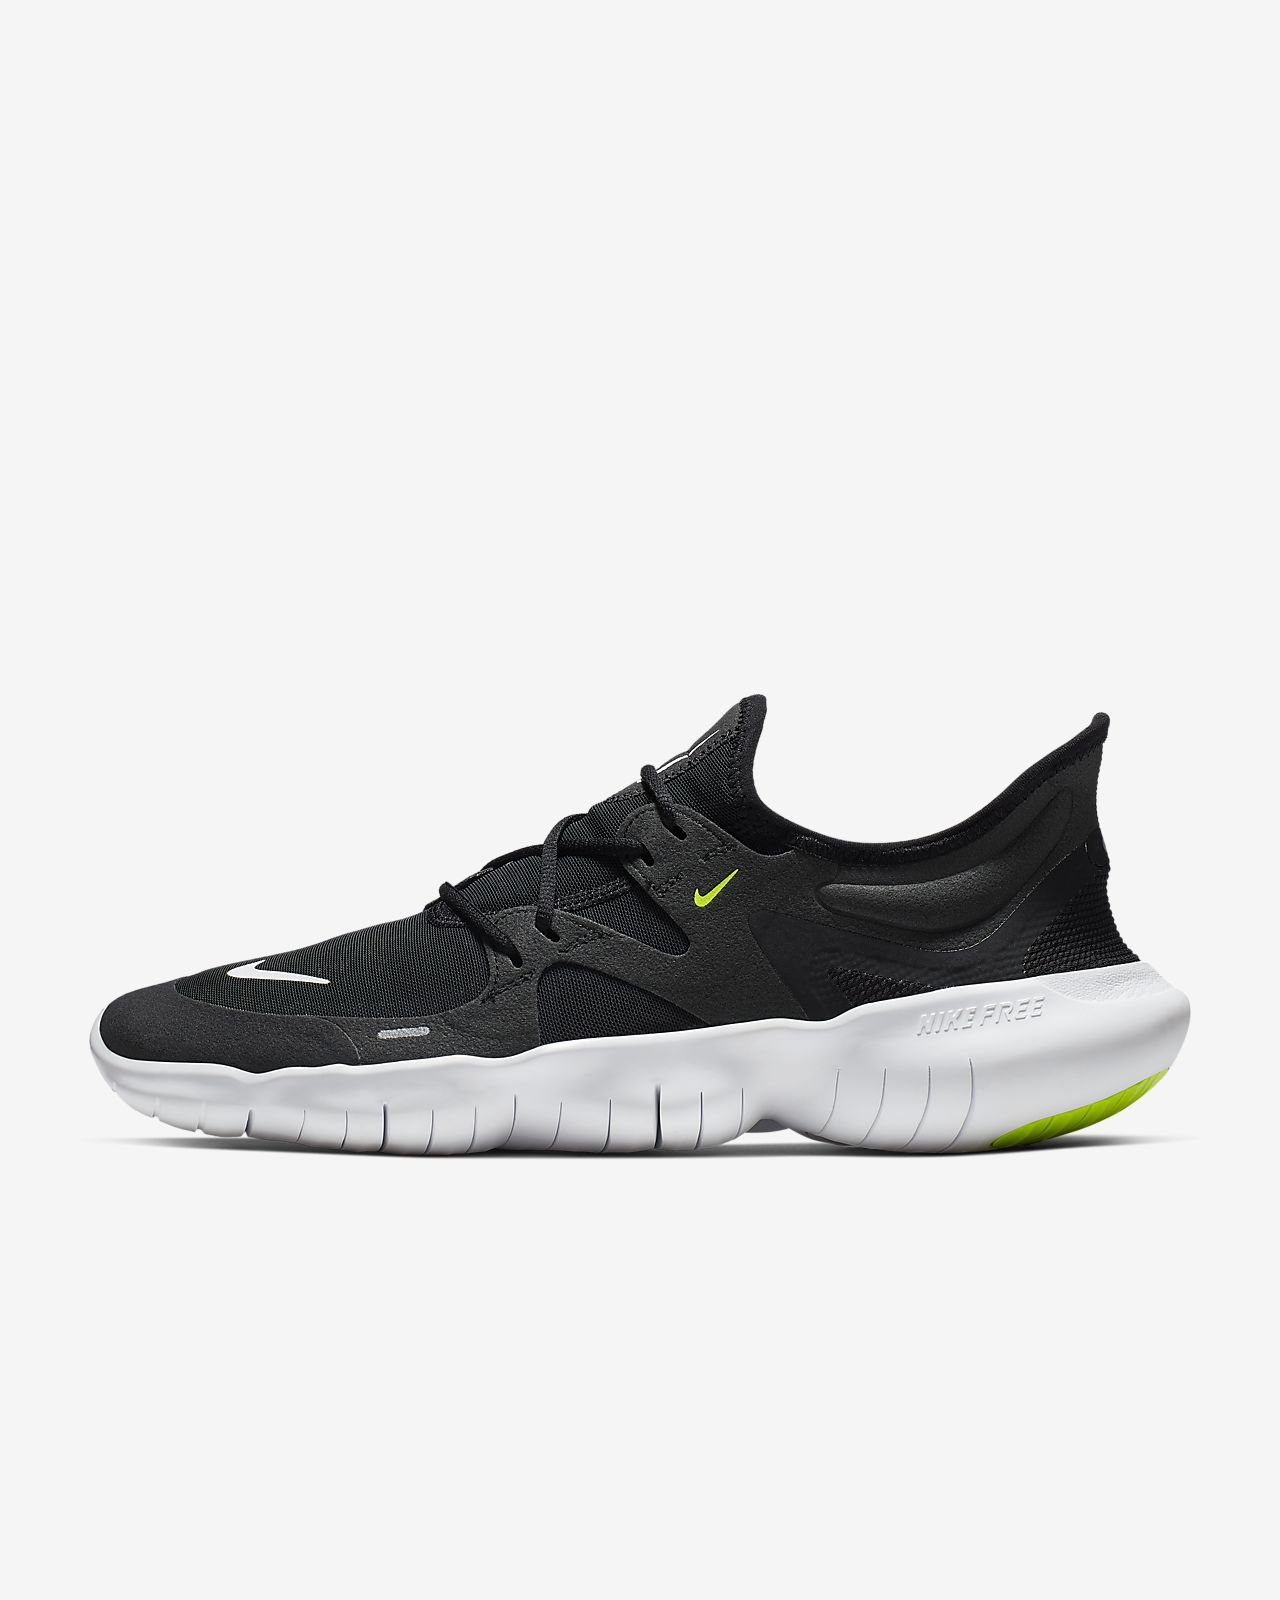 16e272b2c29b Nike Free RN 5.0 Men's Running Shoe. Nike.com